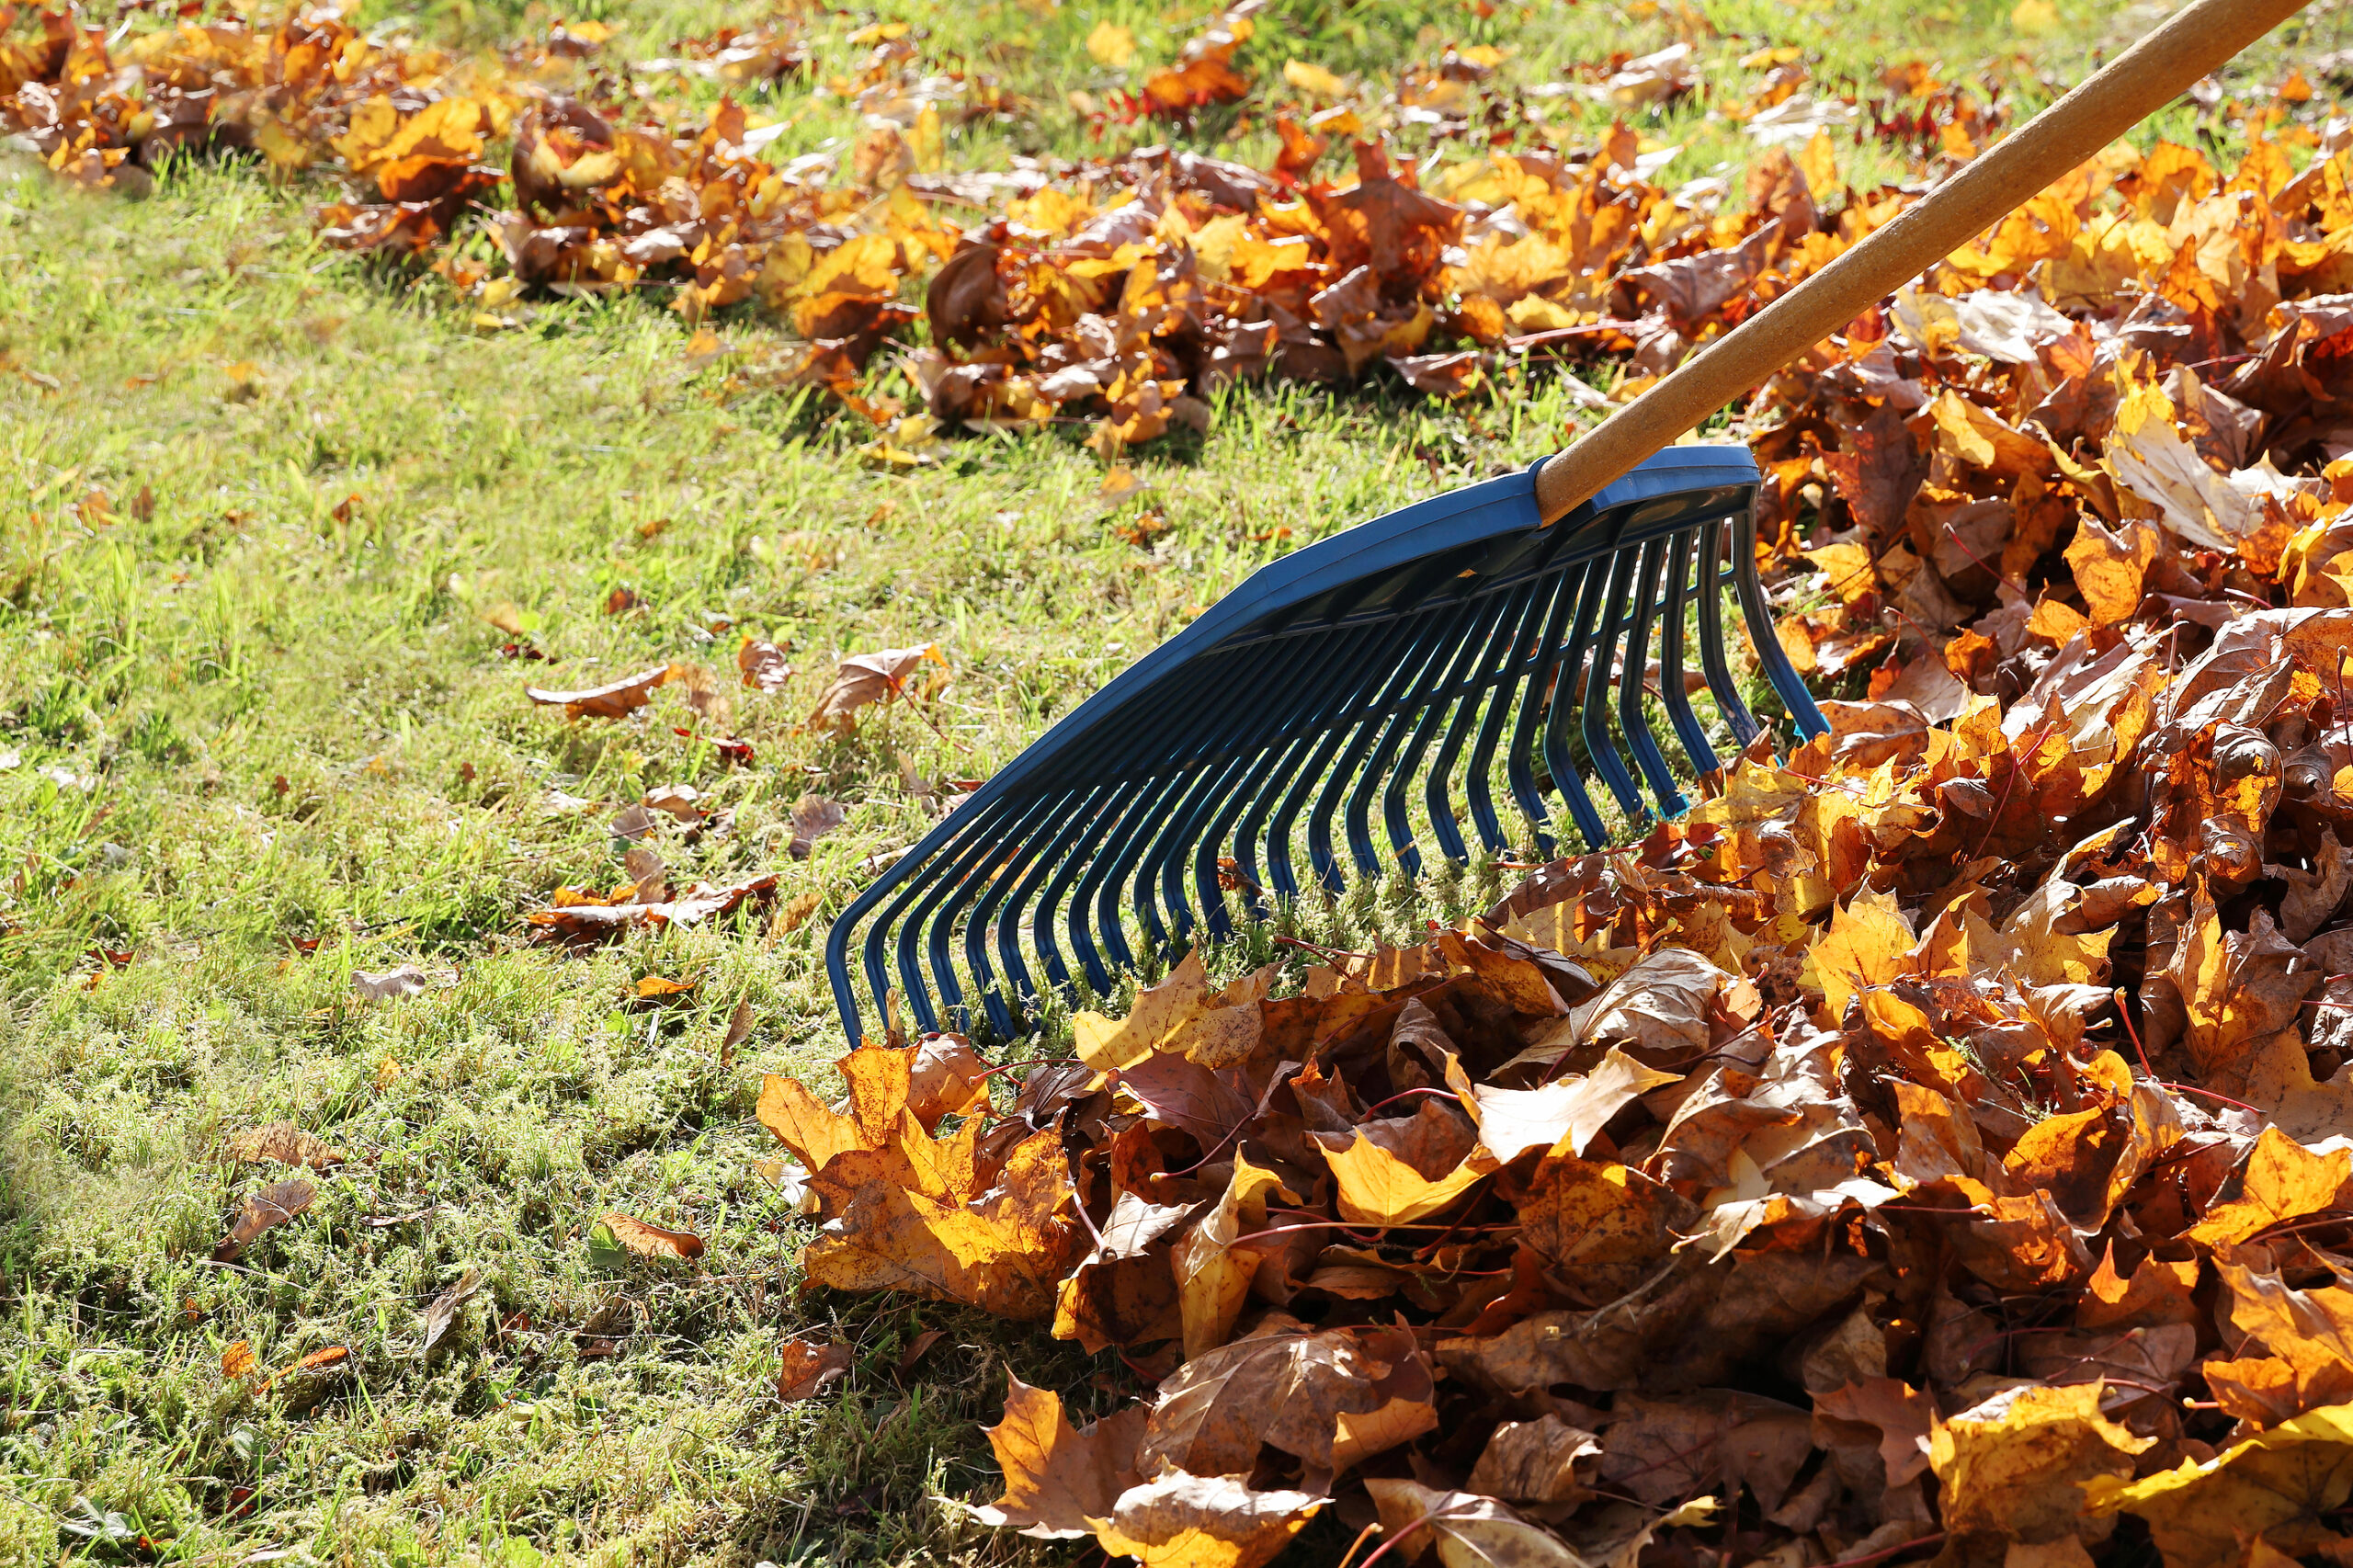 Rake involved in landscape clean-up